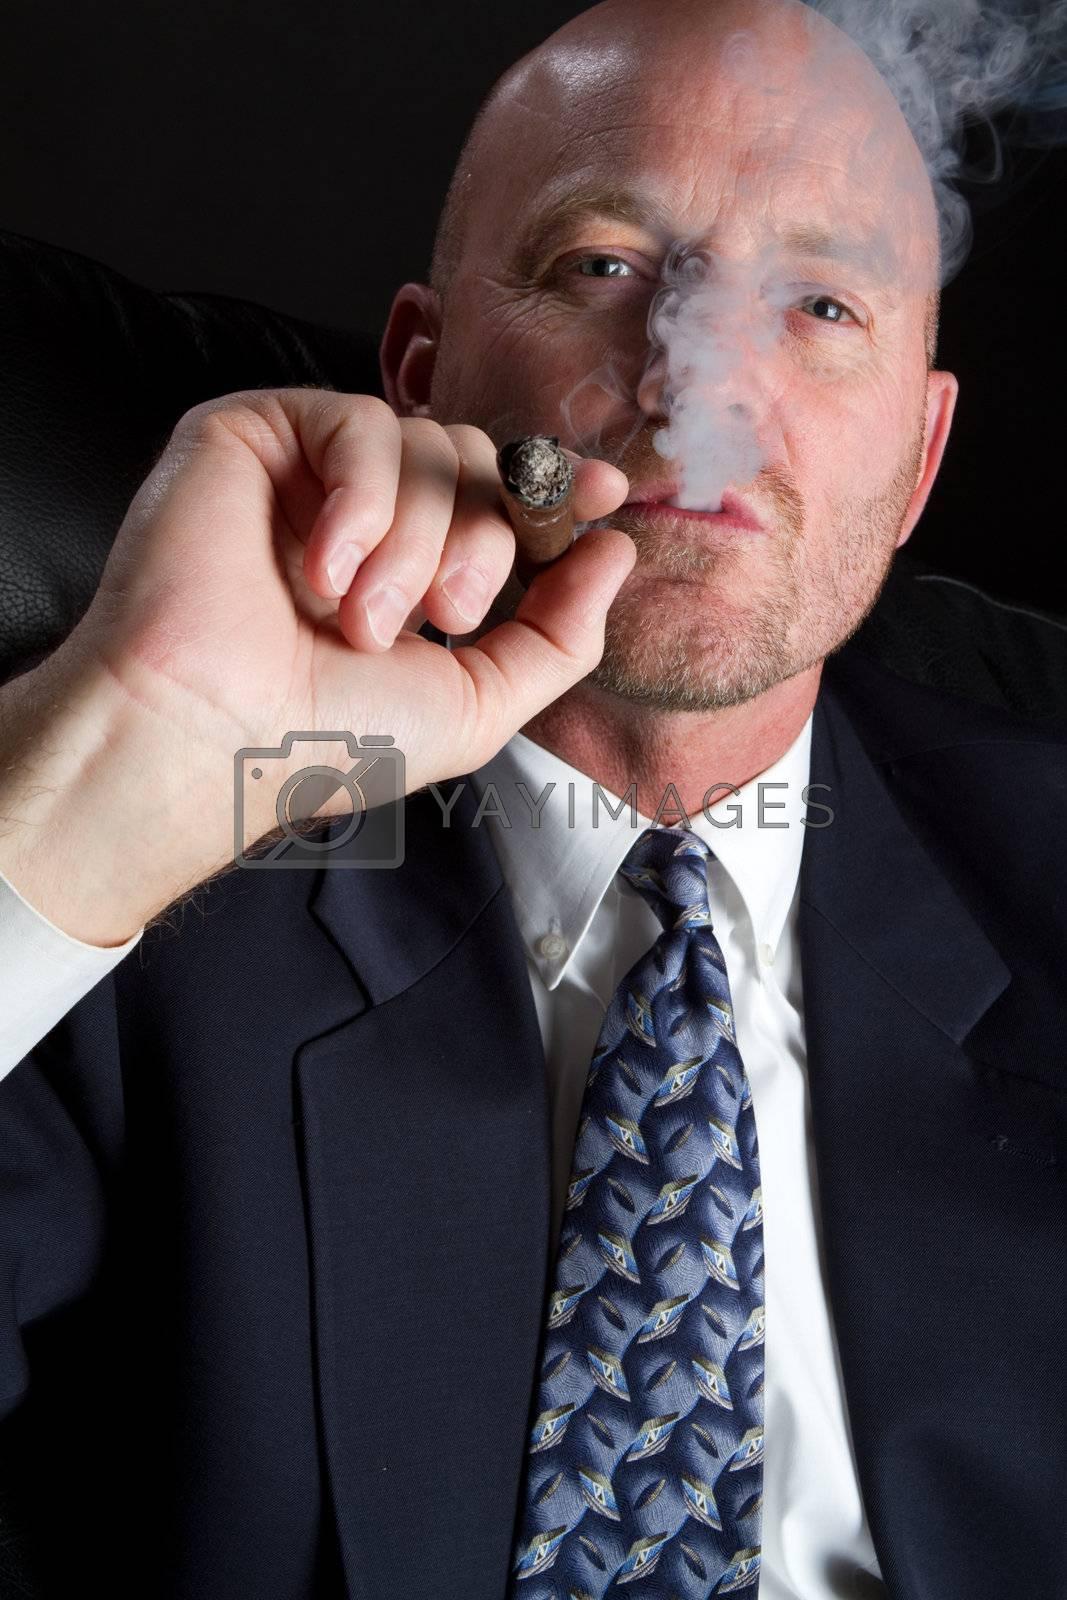 Business man smoking cigar